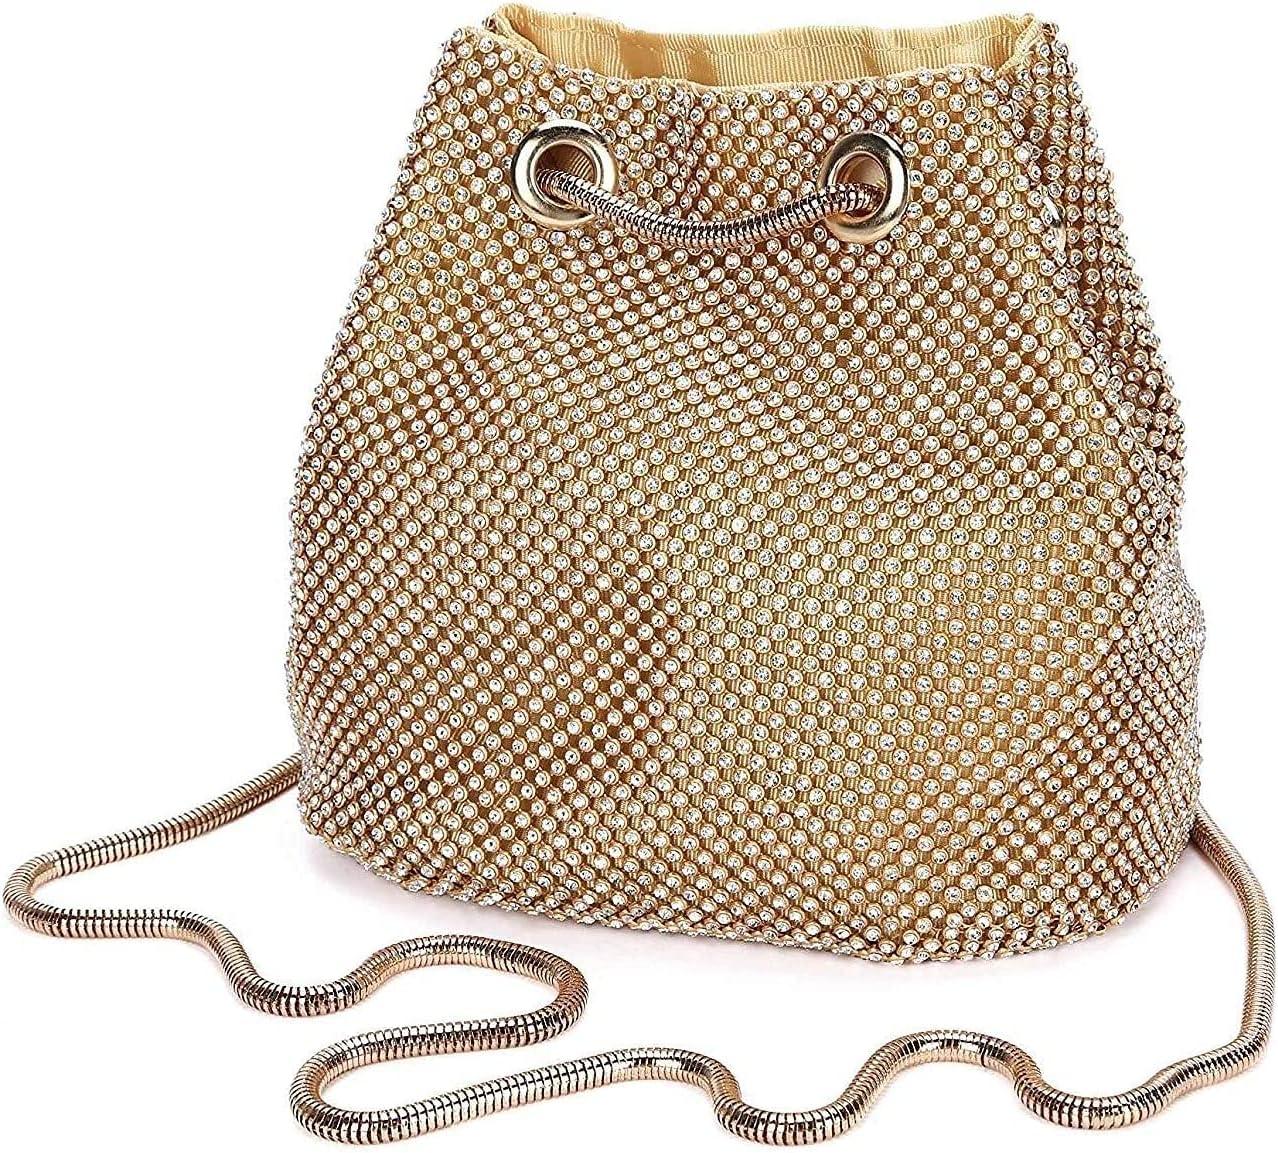 BDBT Women's Evening Handbags Women's Evening Bag Rhinestone Clutch Shoulder Bag Chain Bag Wedding Party Disco (Color : Gold)